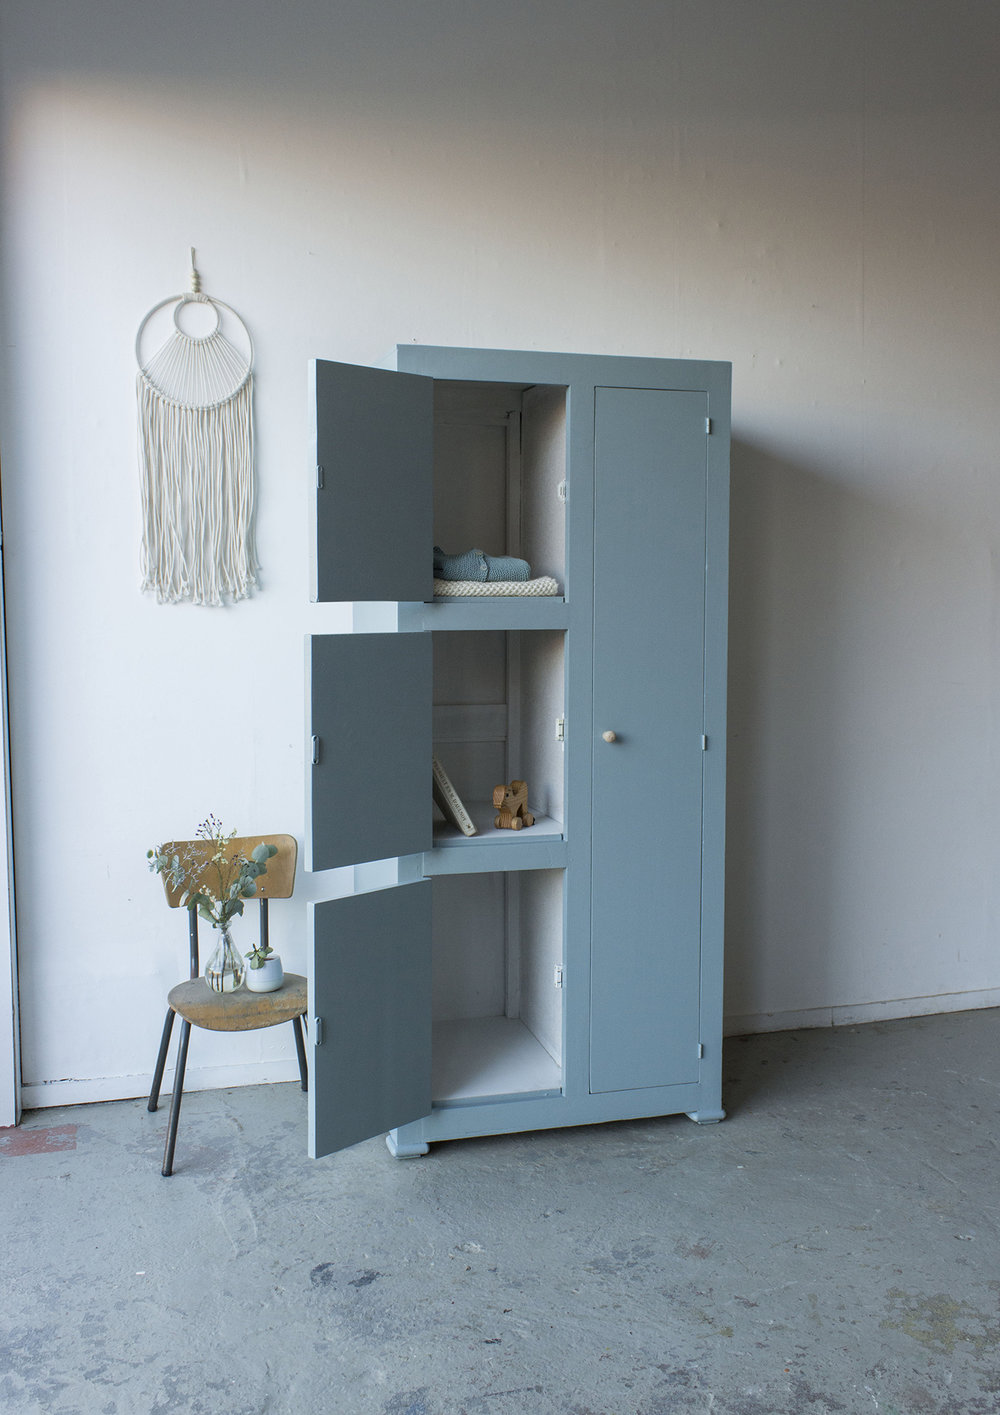 Kust blauwe vintage kledingkast -  Firma zoethout_3.jpg